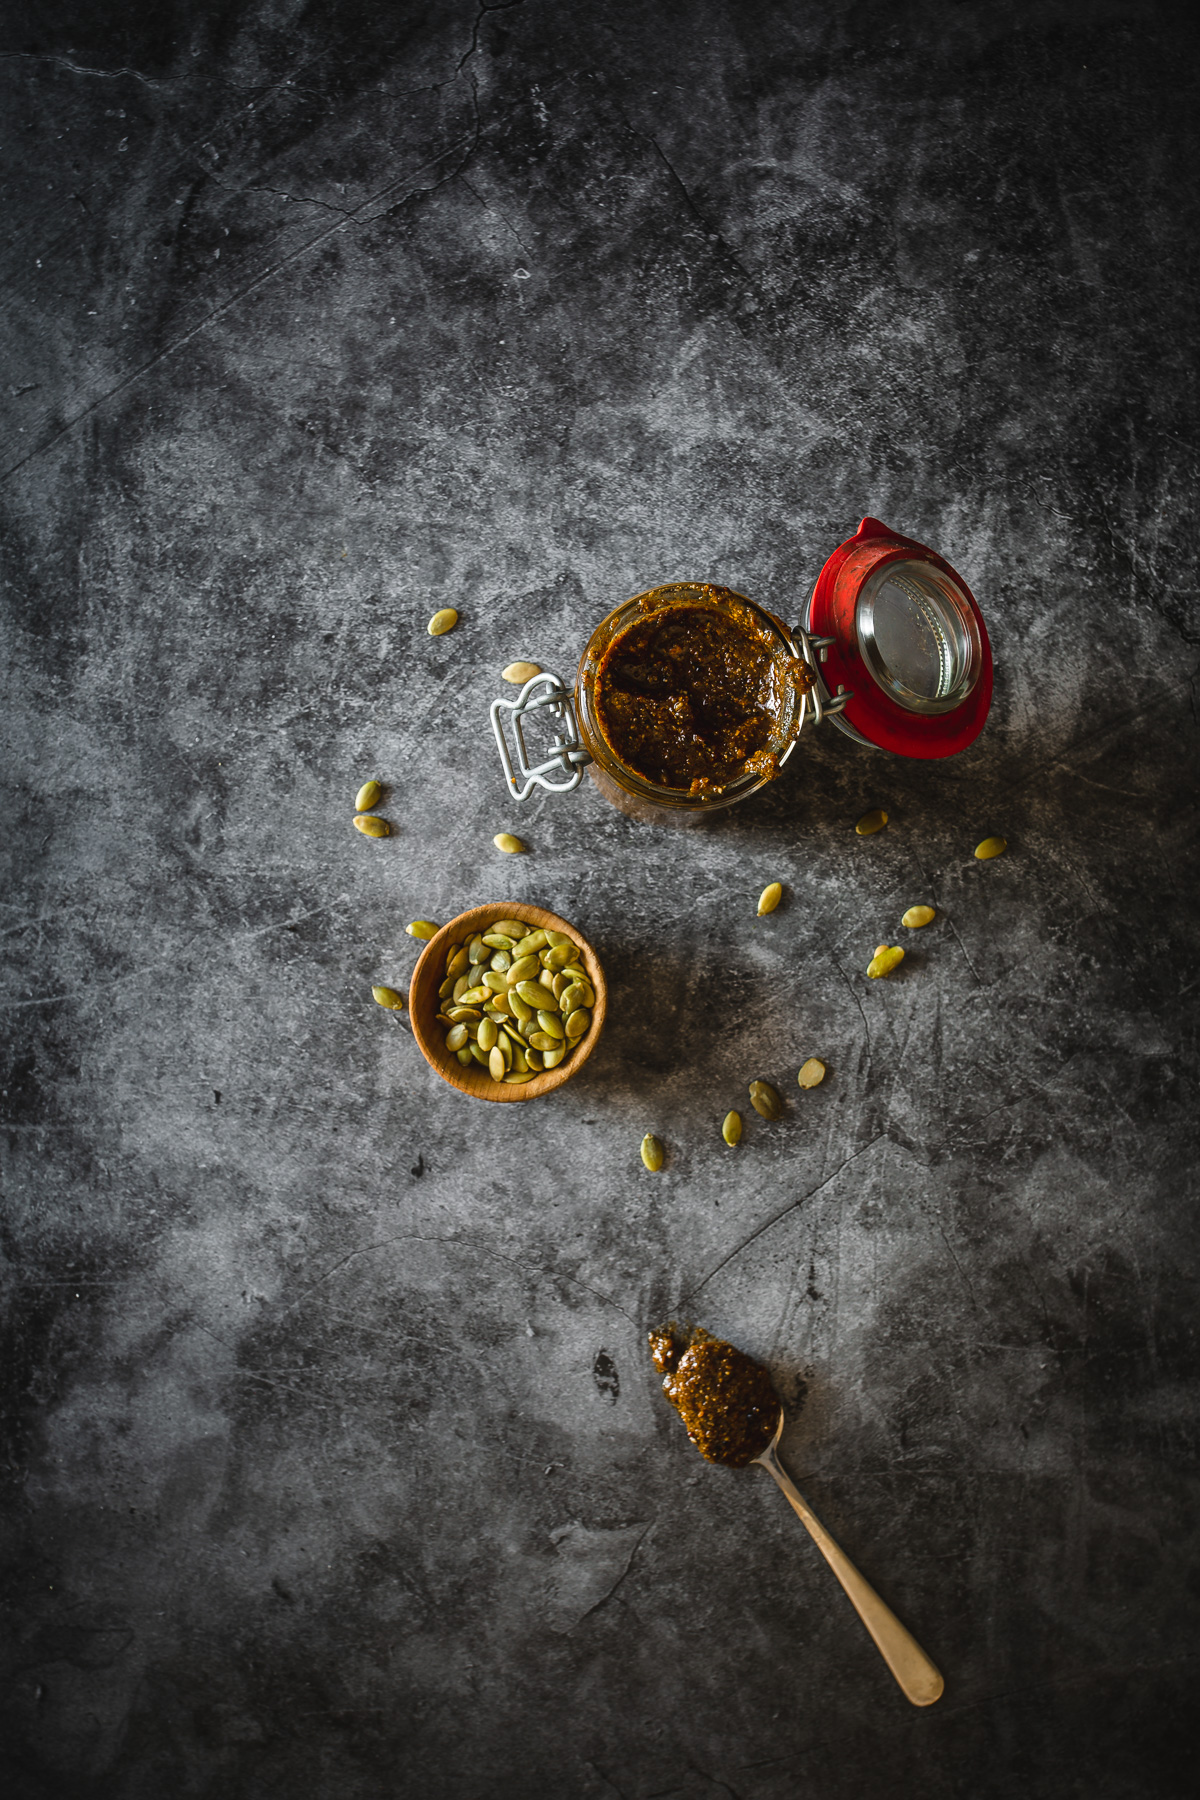 pepita salsa with pumpkin seeds and spoon